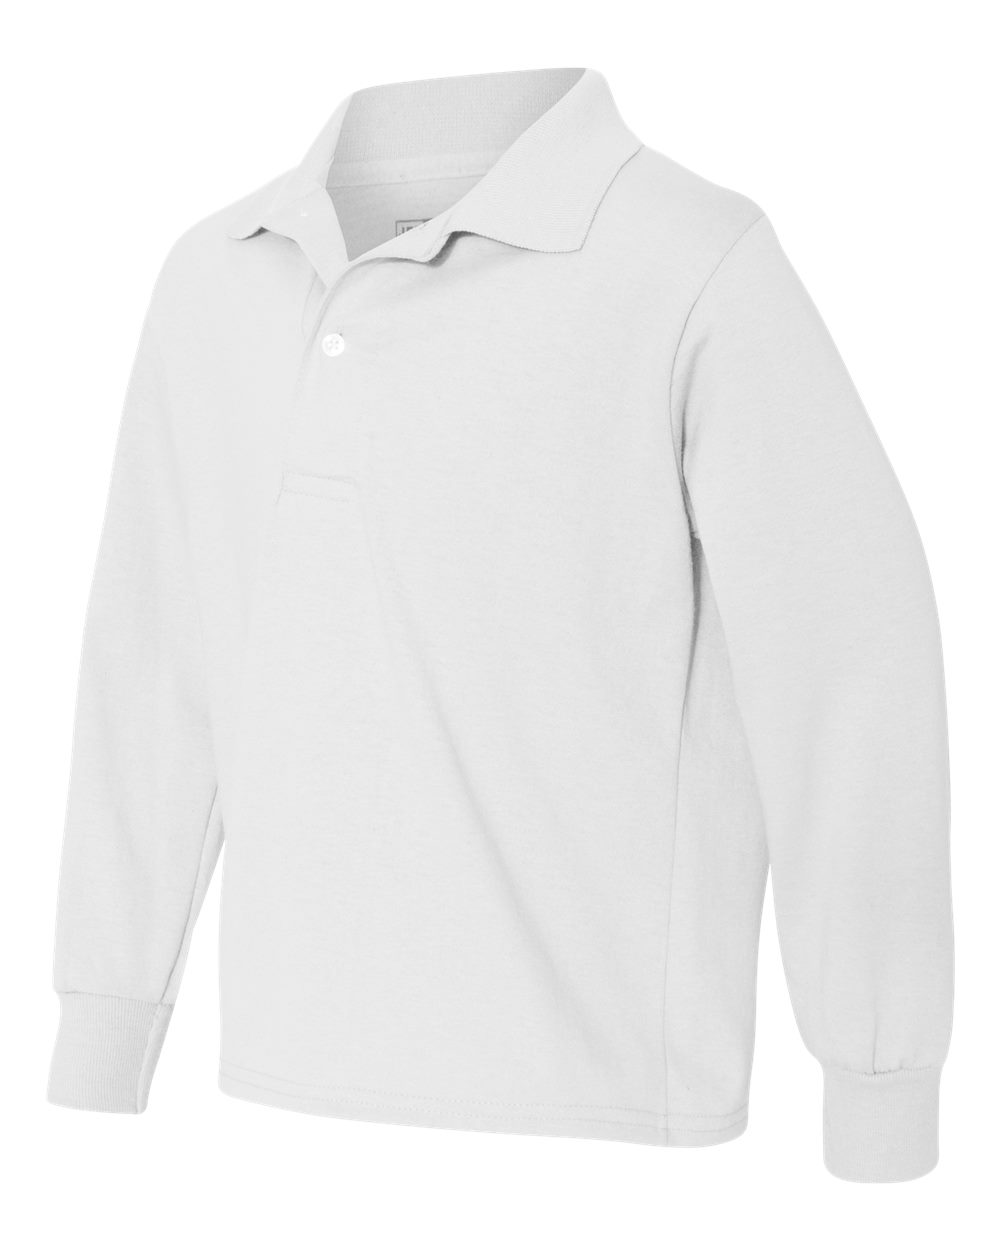 Jerzees 437YLR - SpotShield Youth Long Sleeve Sport Shirt